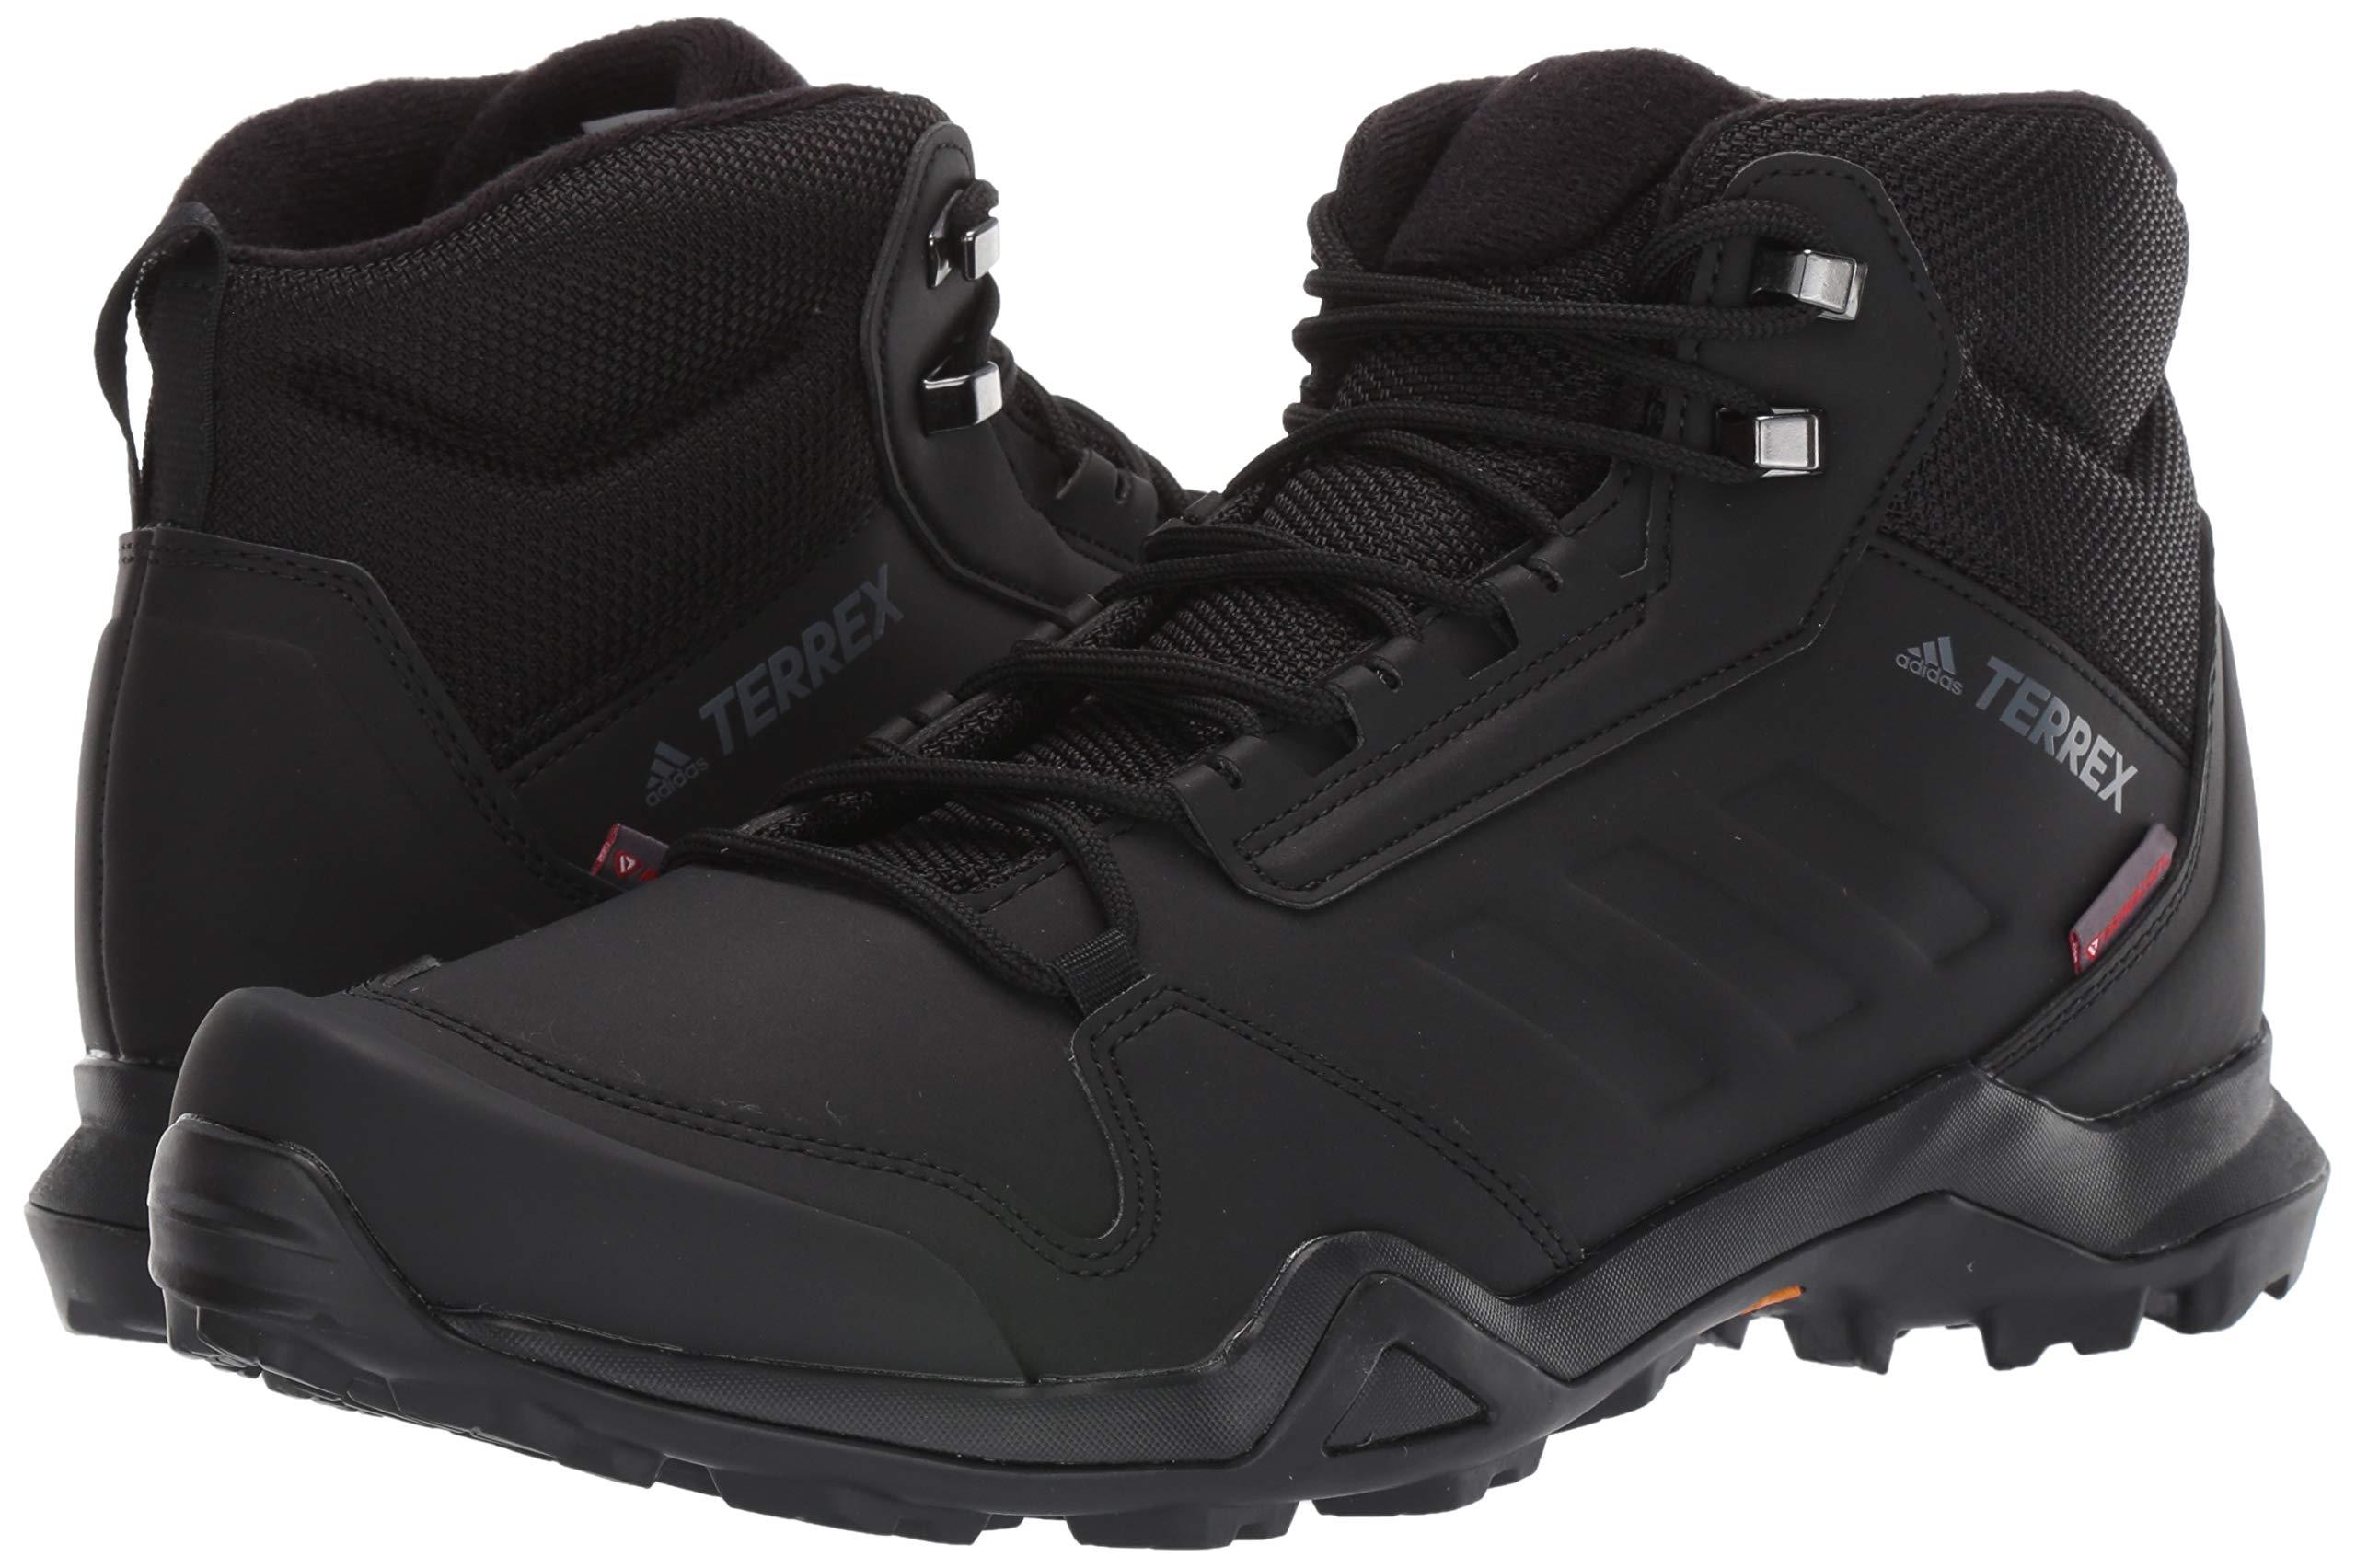 adidas outdoor Men's Terrex Ax3 Beta